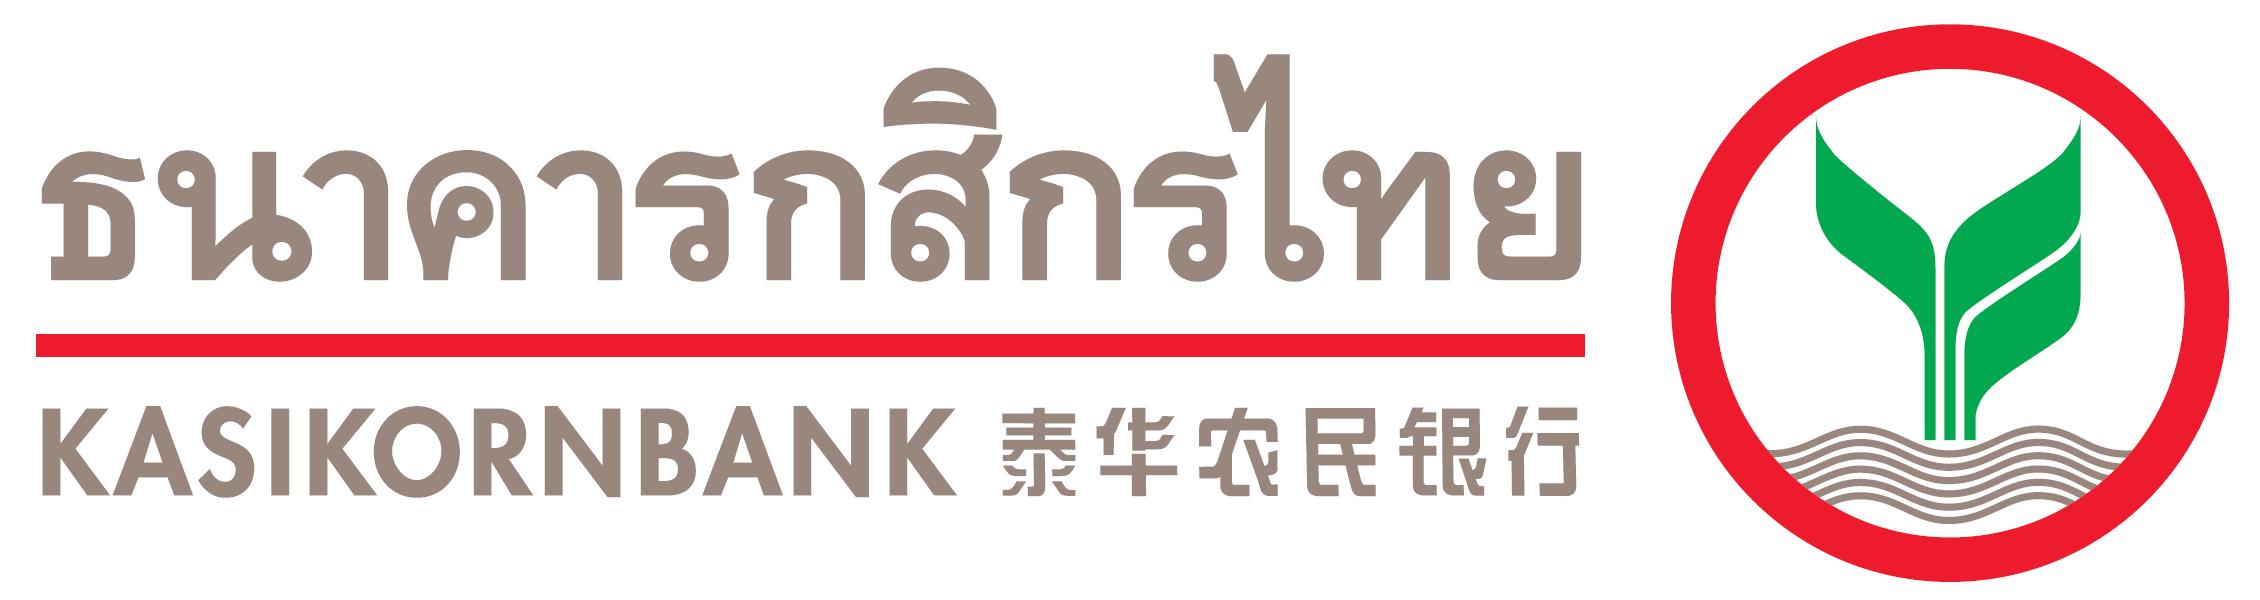 http://www.kasikornbank.com/TH/ServicesChannel/SearchServiceChannel/Internet/Pages/KCyberBanking.aspx